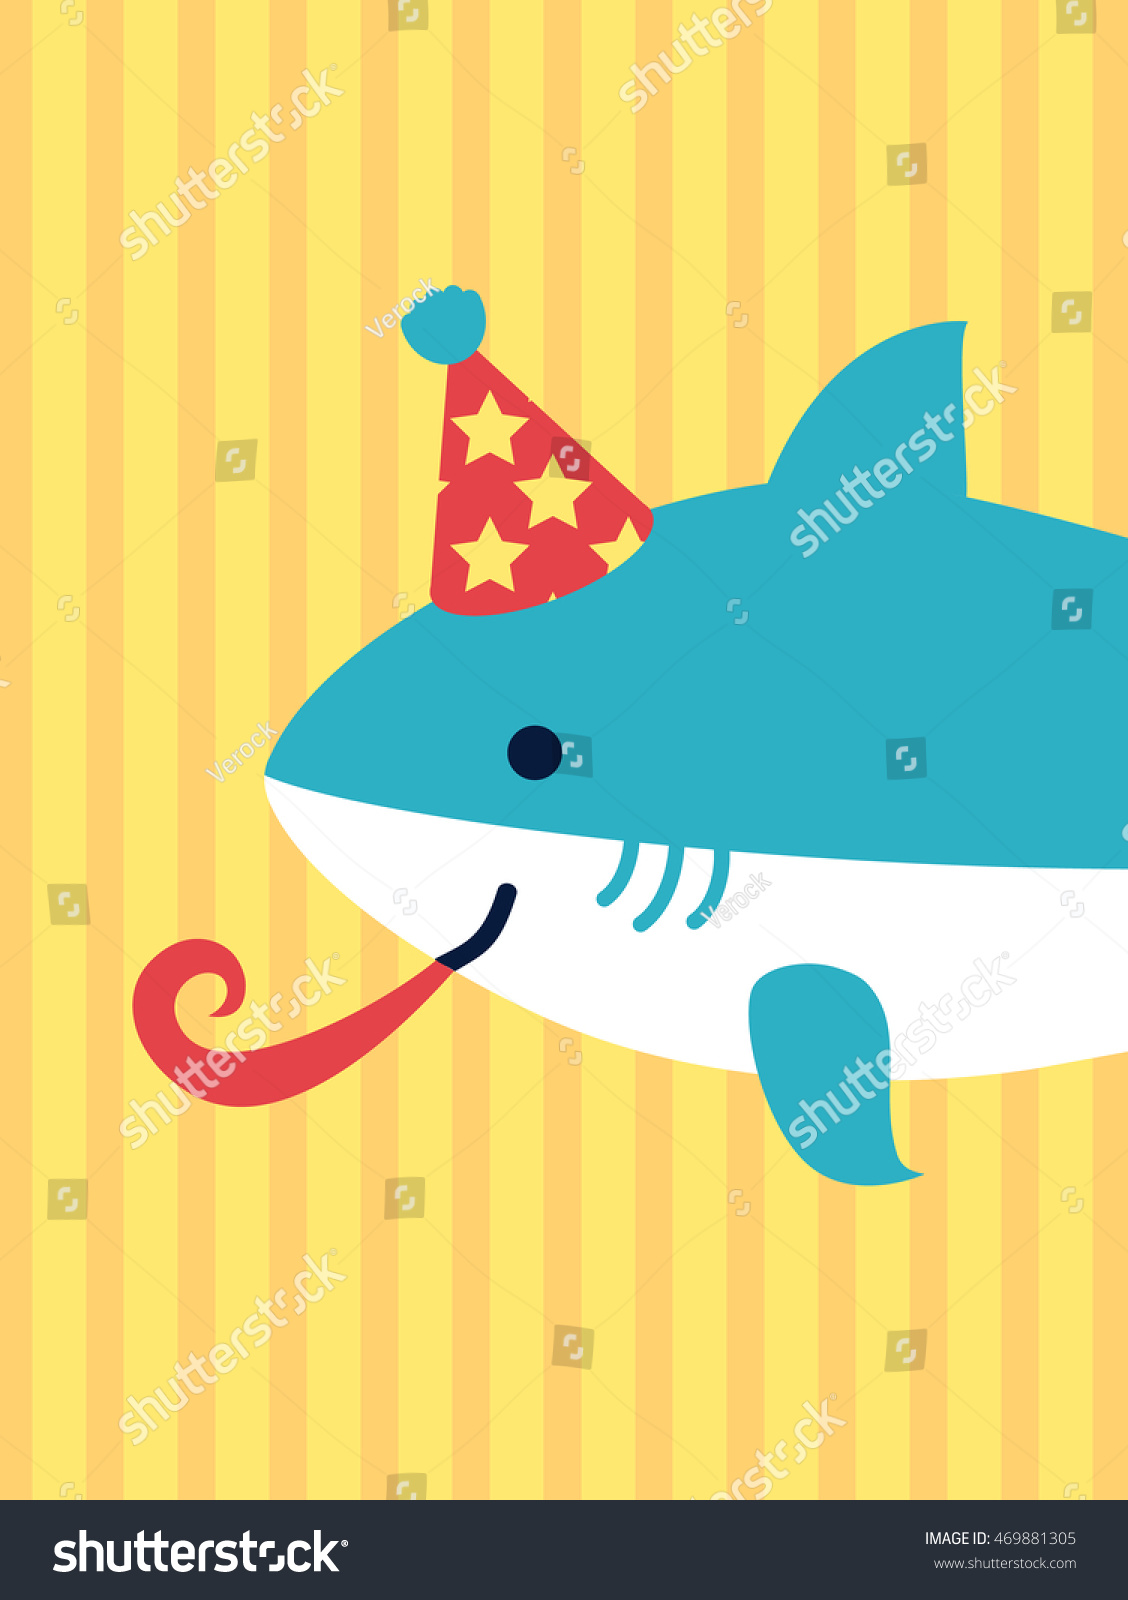 happy birthday card cute cartoon cheerful stock illustration, Birthday card